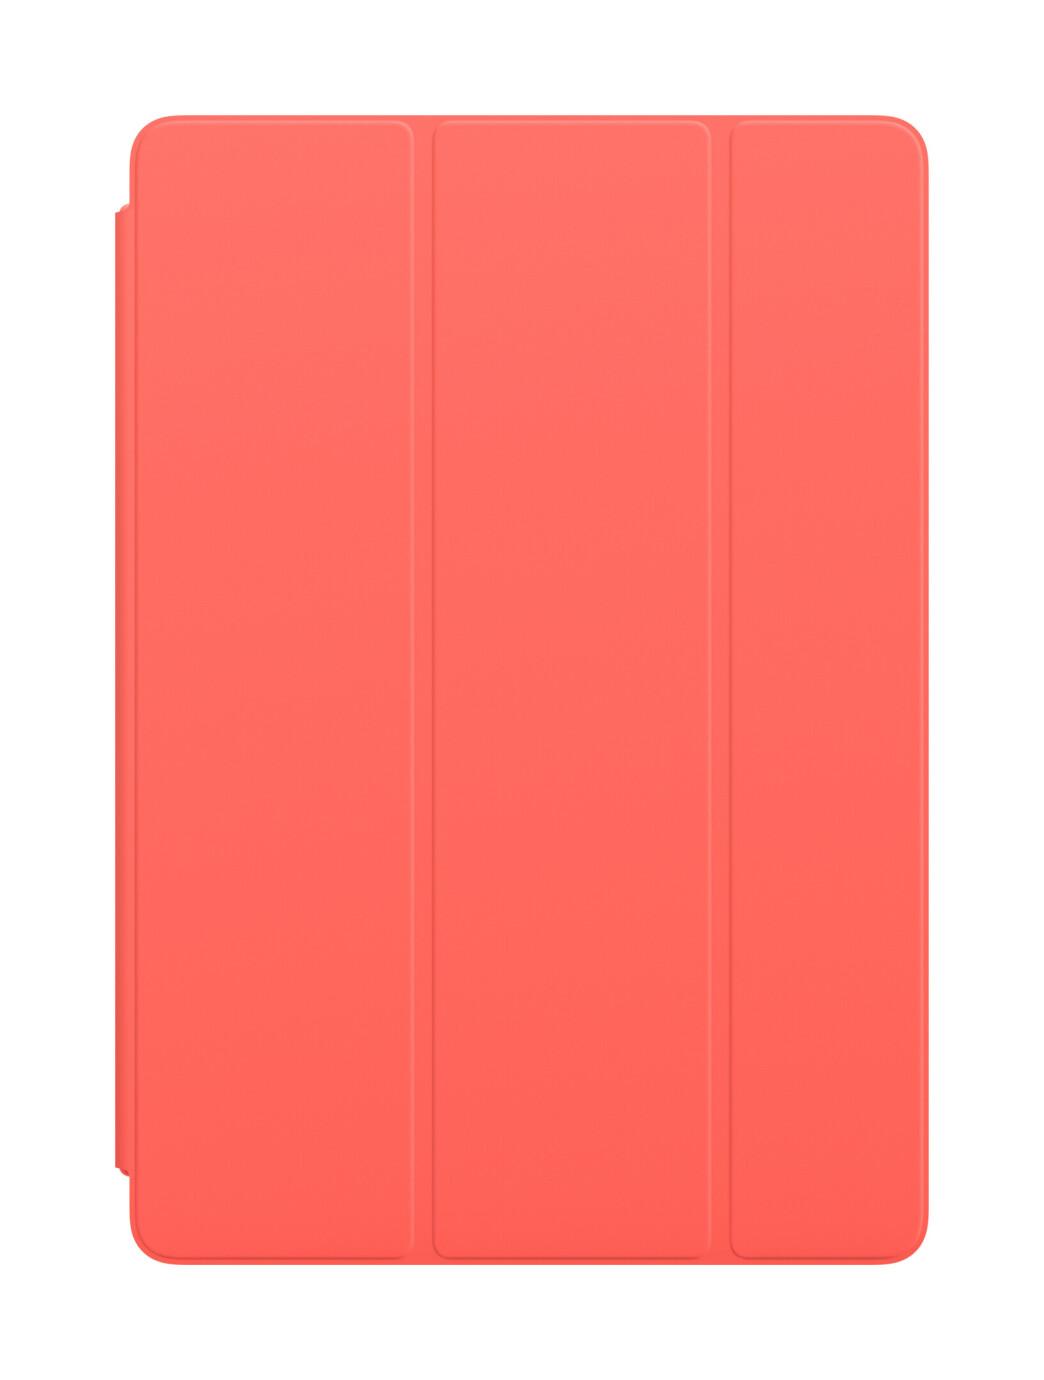 Apple Smart Cover für iPad mini (4+5. Generation) - Zitruspink